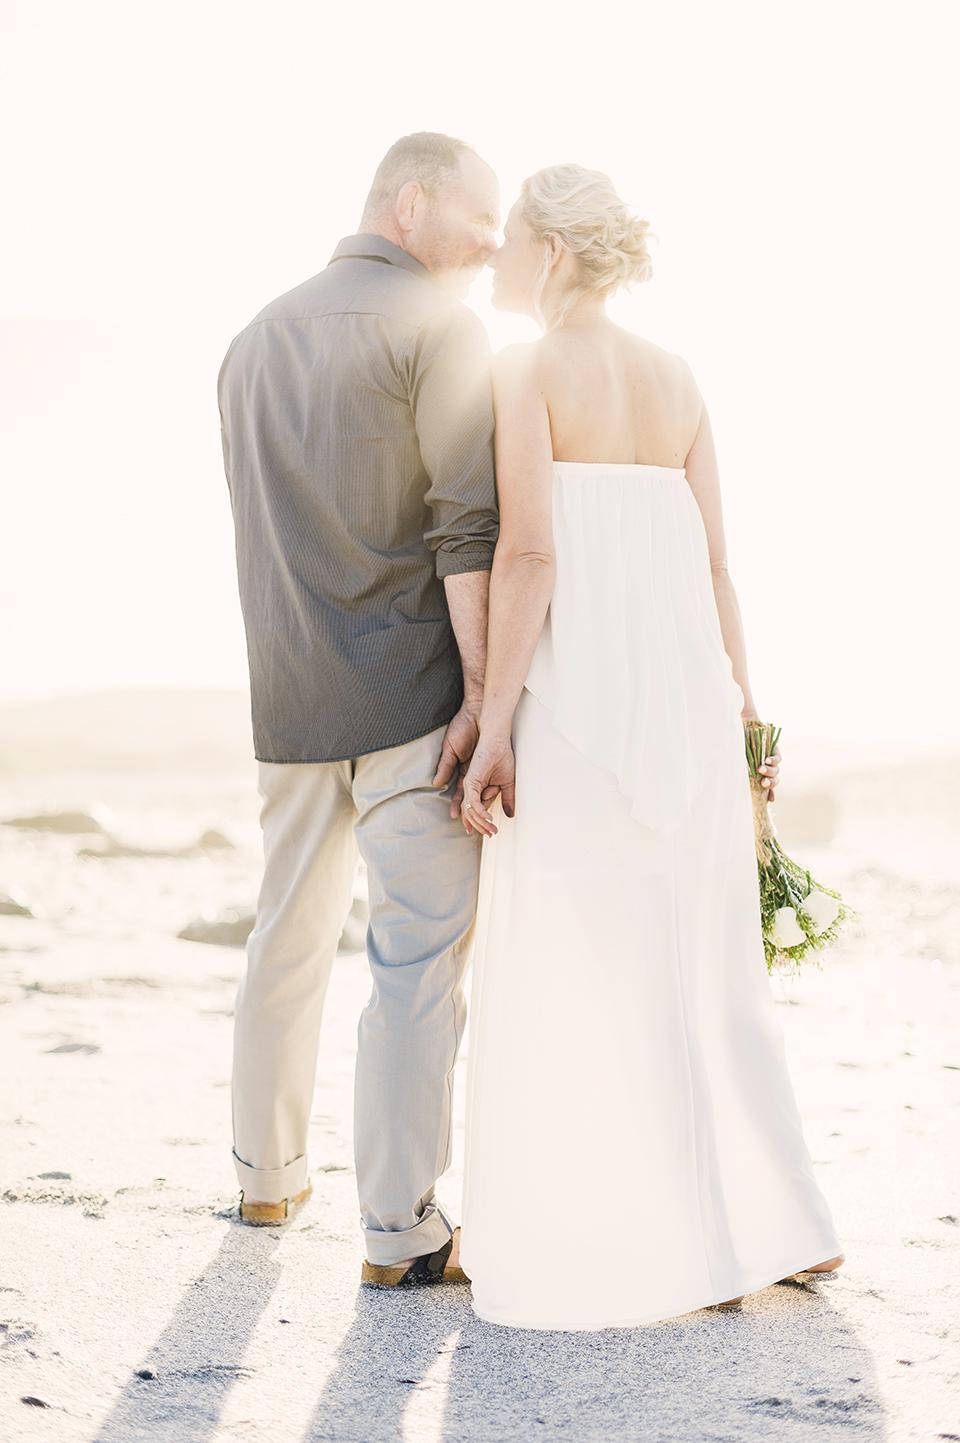 RyanParker_CapeTown_Photographer_Wedding_Hermanus_A&B_DSC_9467.jpg